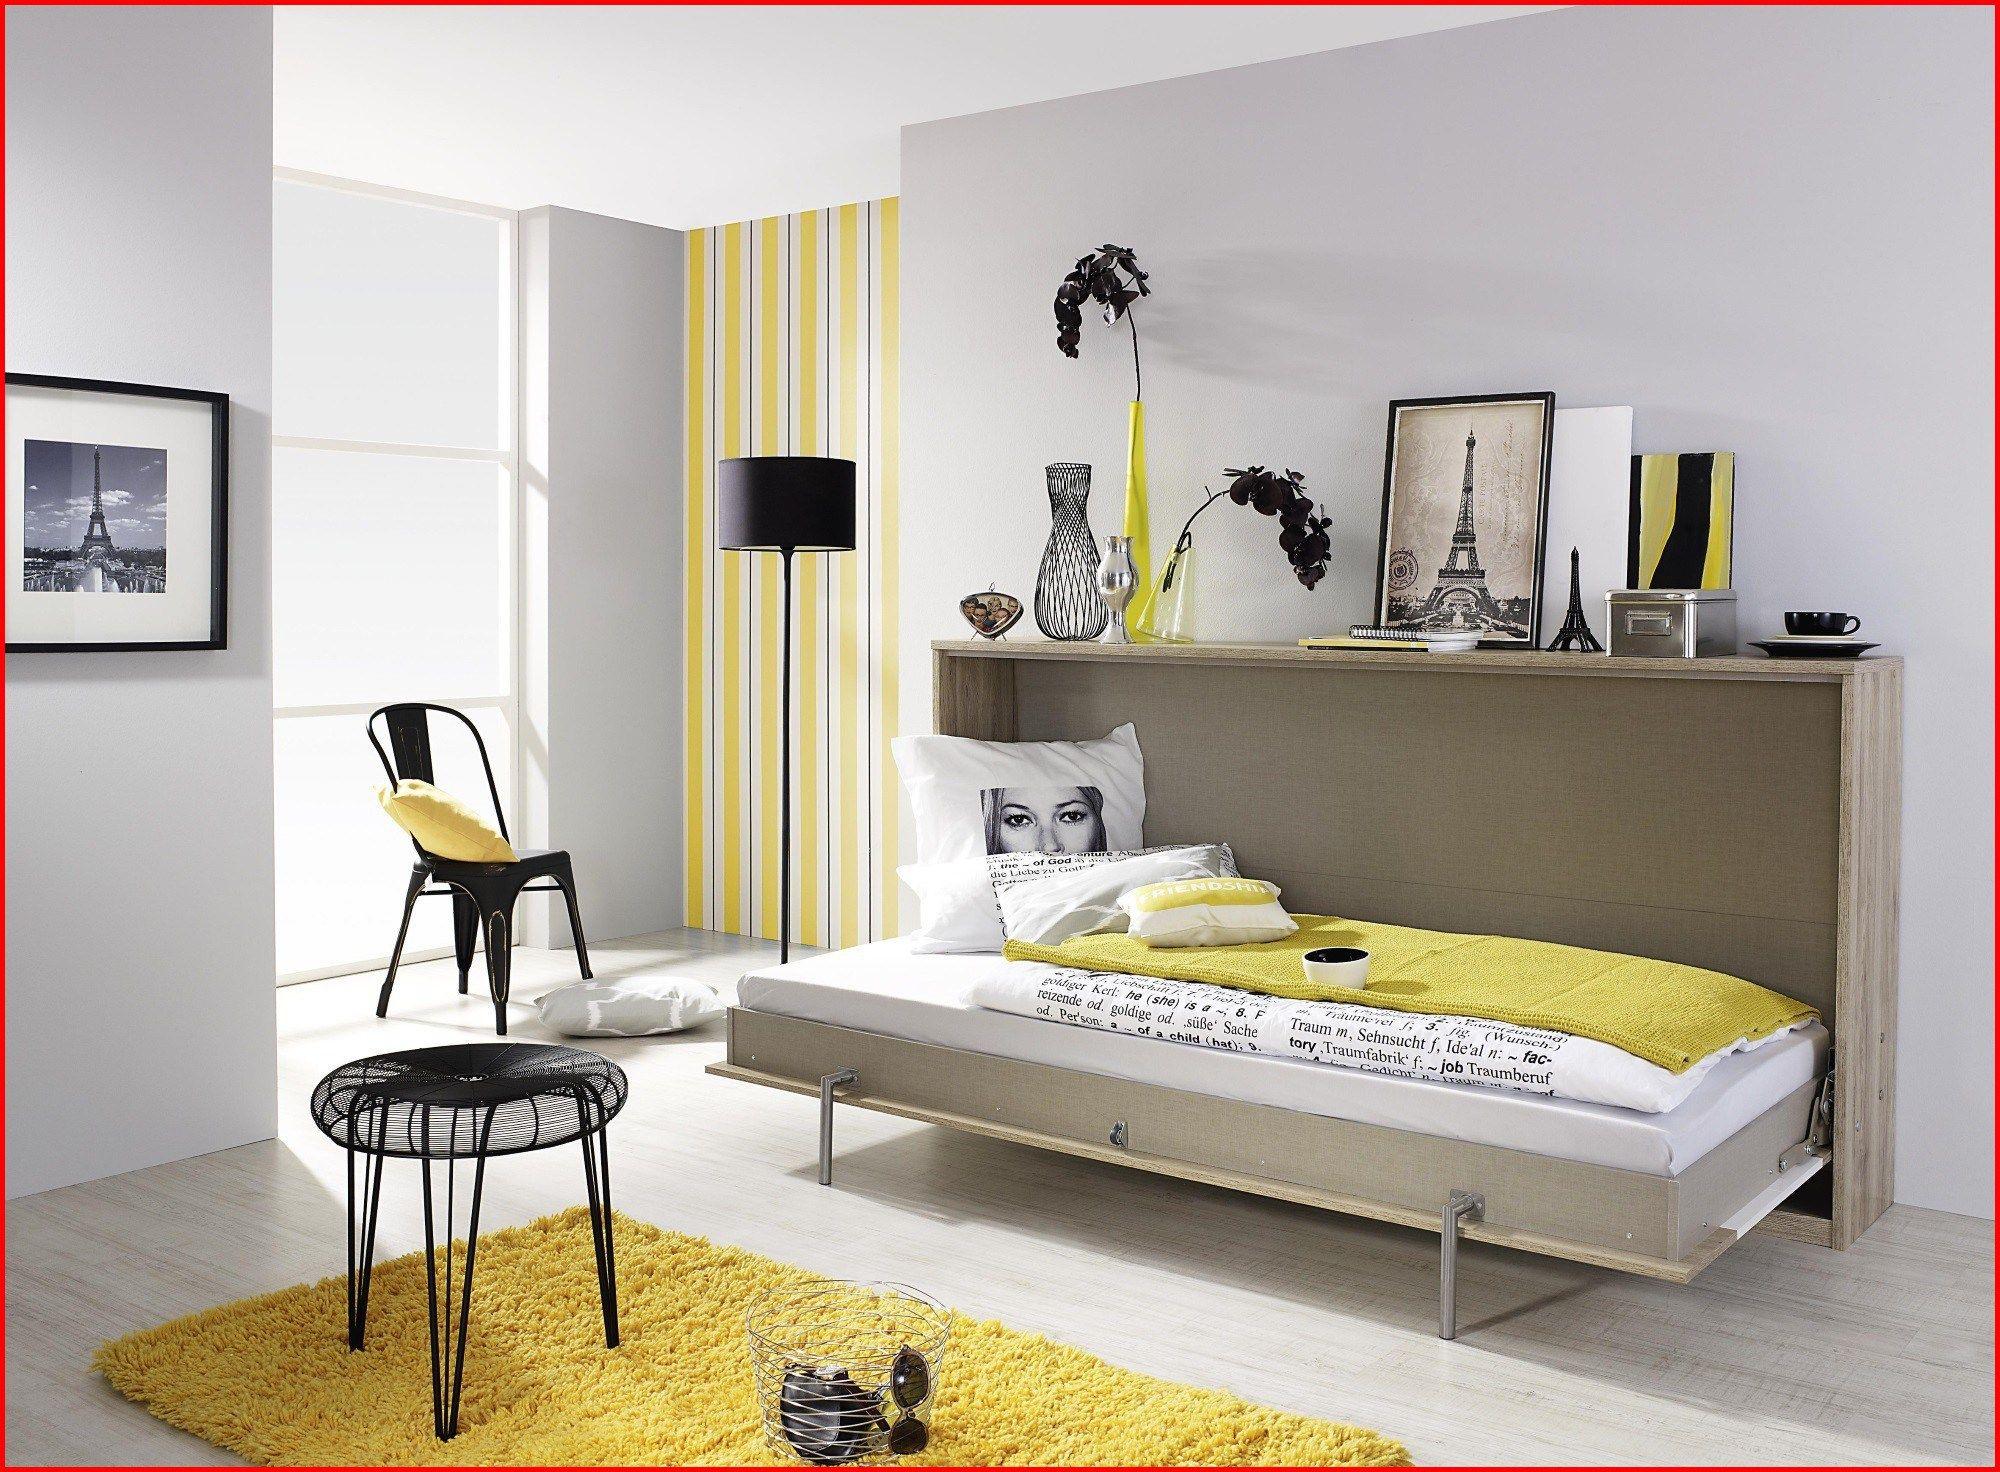 Luxury Chambre Fille Princesse Ikea Deco Chambre Garcon Idee Deco Chambre Deco Chambre Bebe